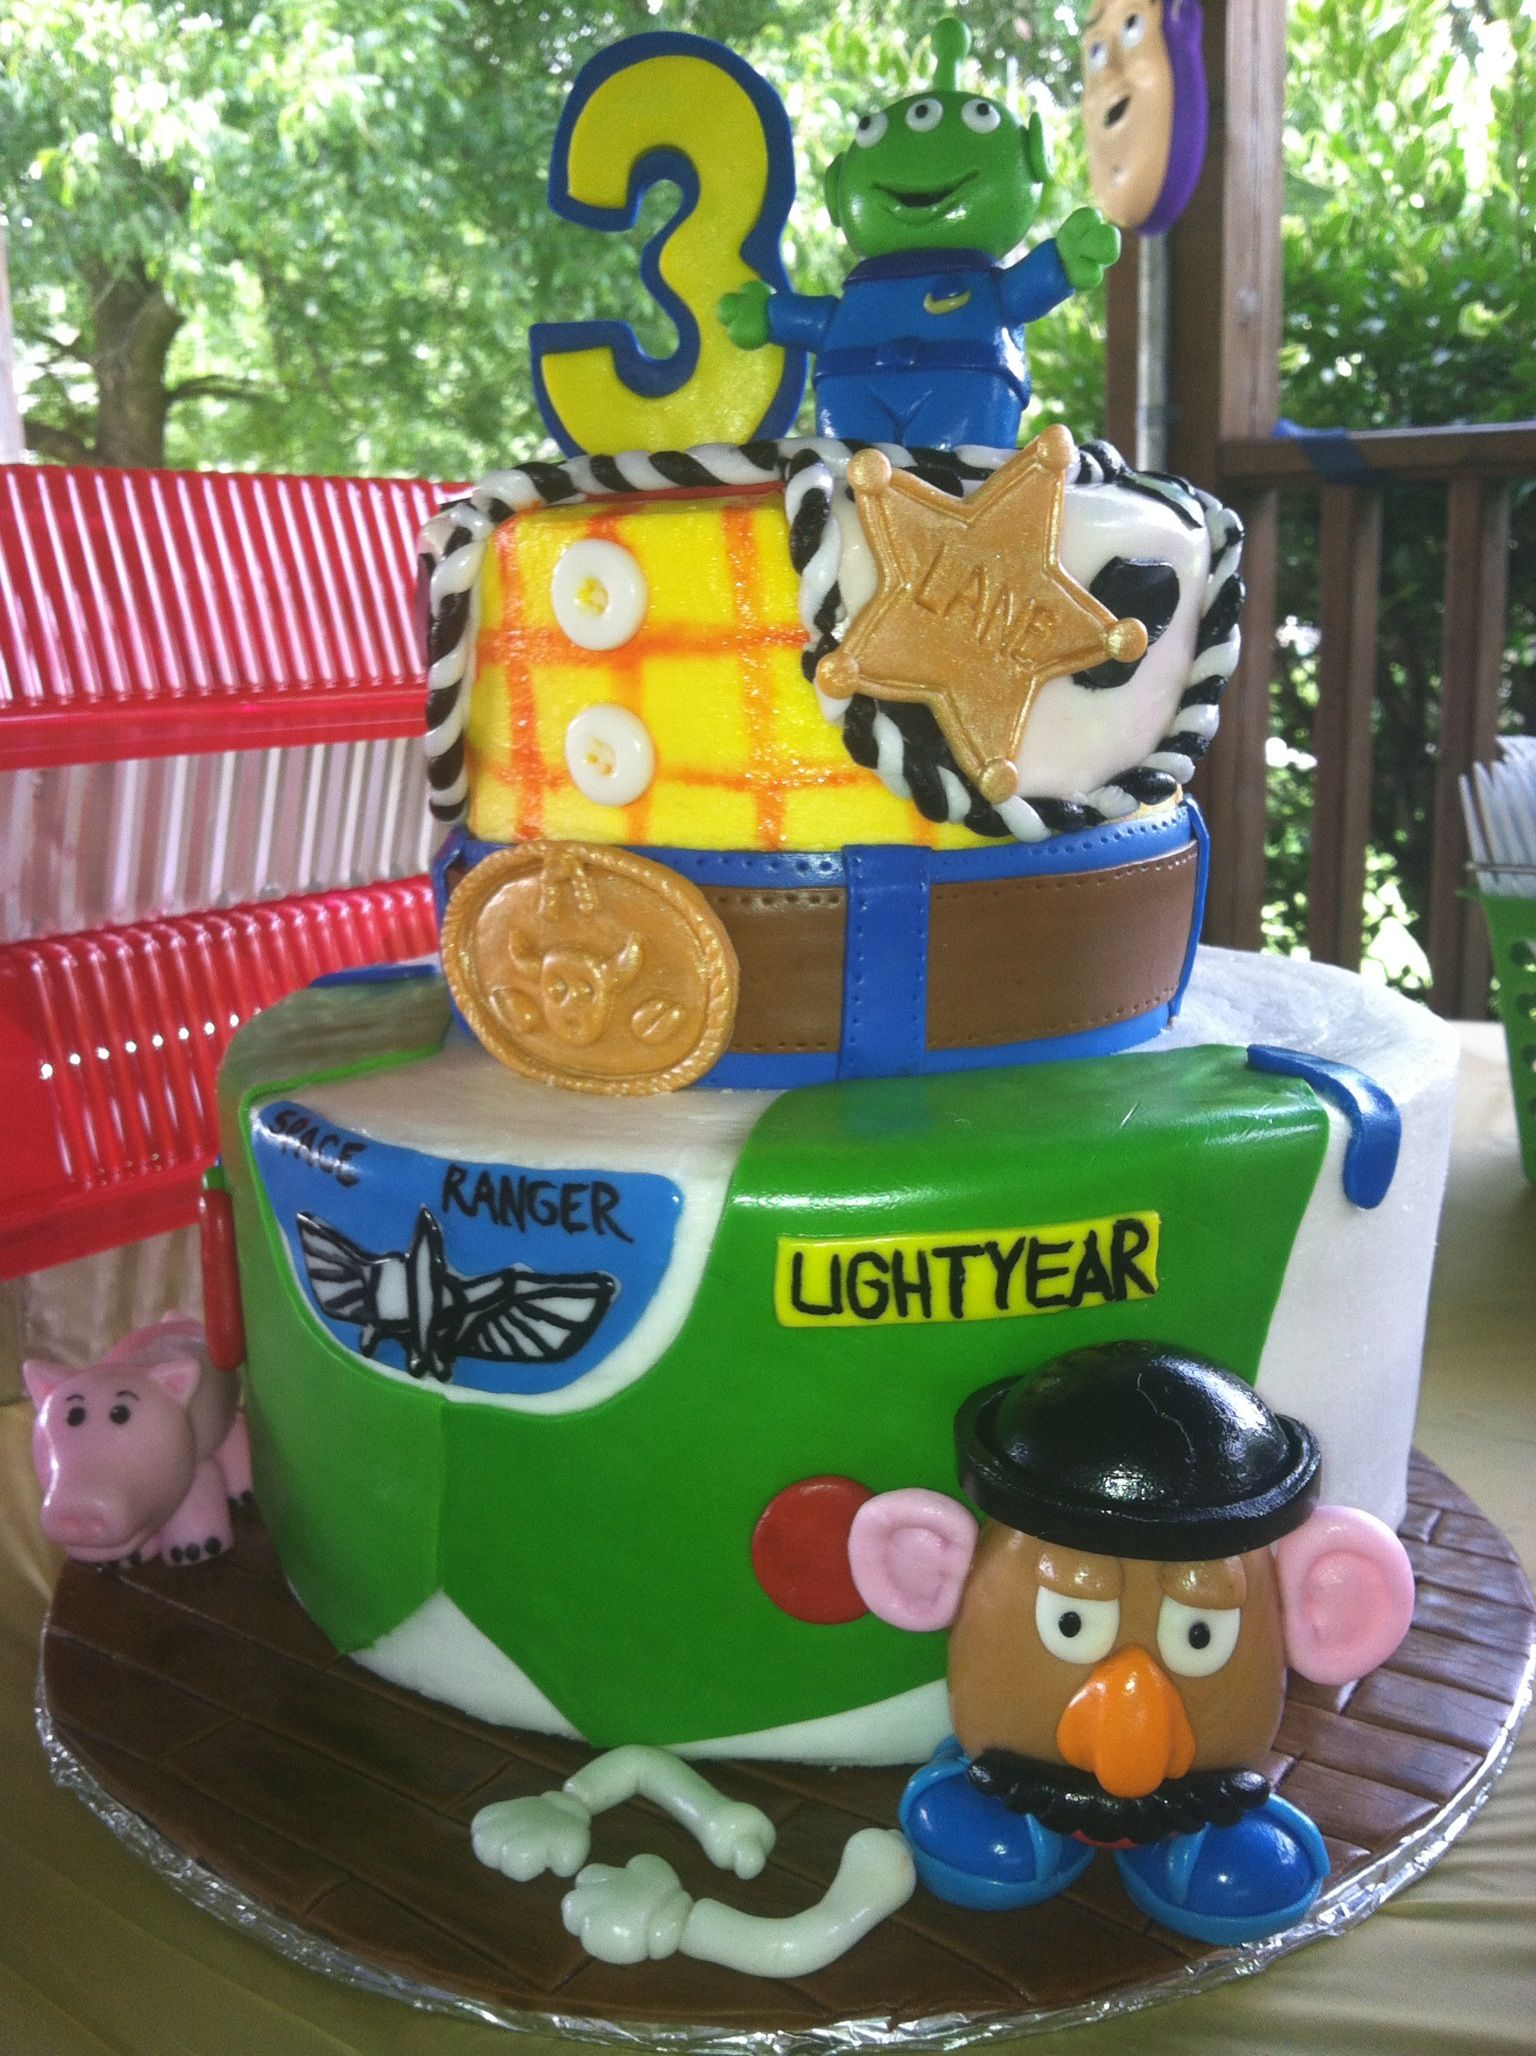 Lanes cake Birthday Party Ideas Pinterest Lane cake and